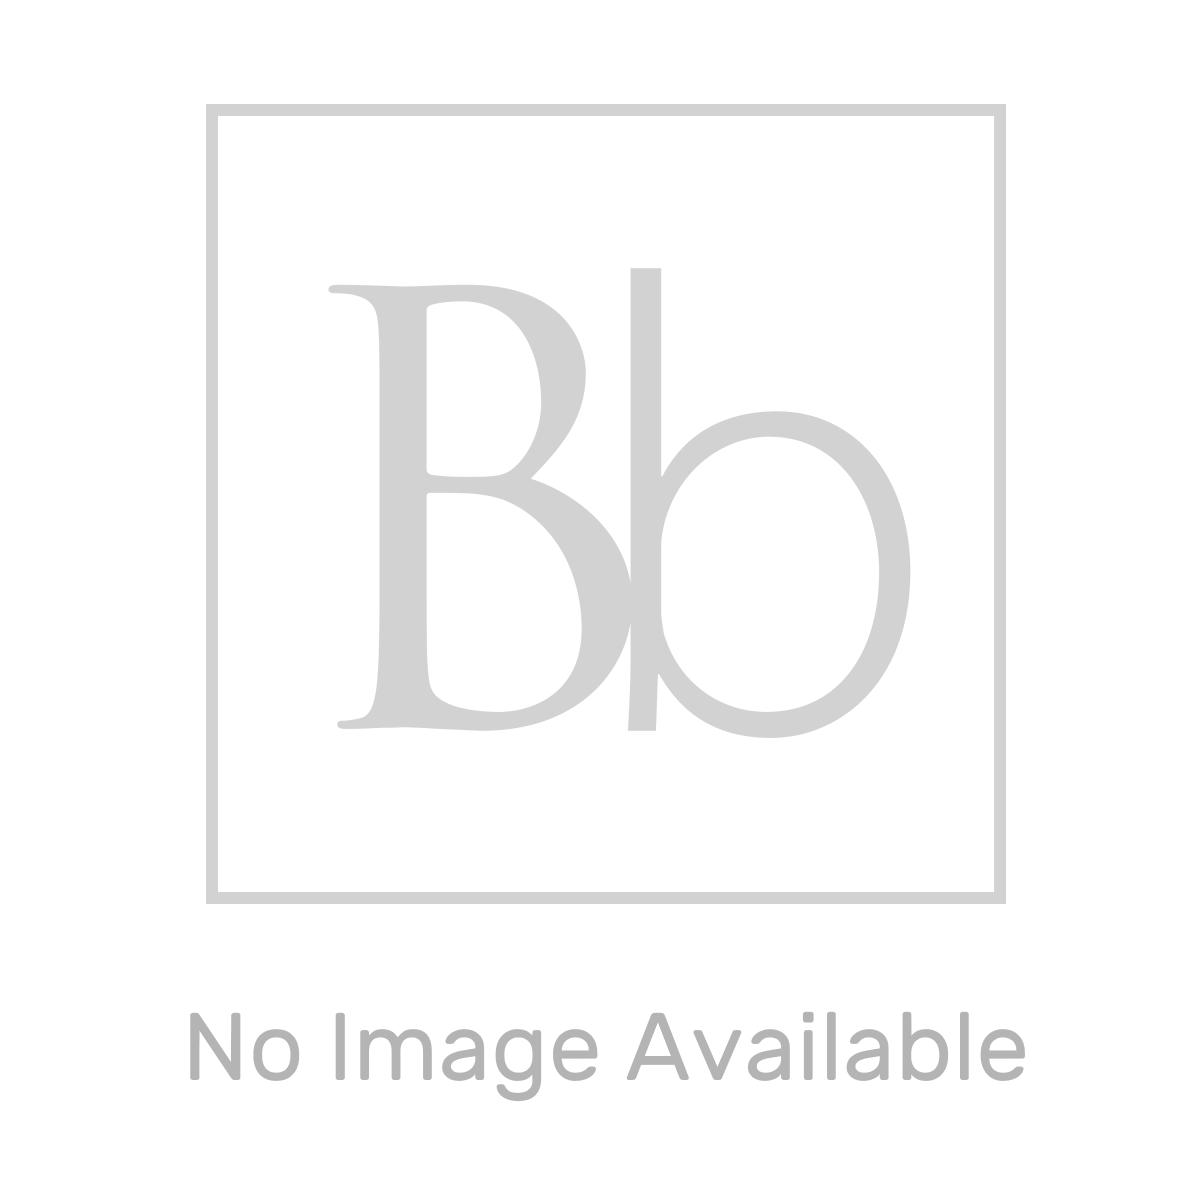 Nuie Athena Driftwood 2 Drawer Floor Standing Vanity Unit with 18mm Worktop 800mm